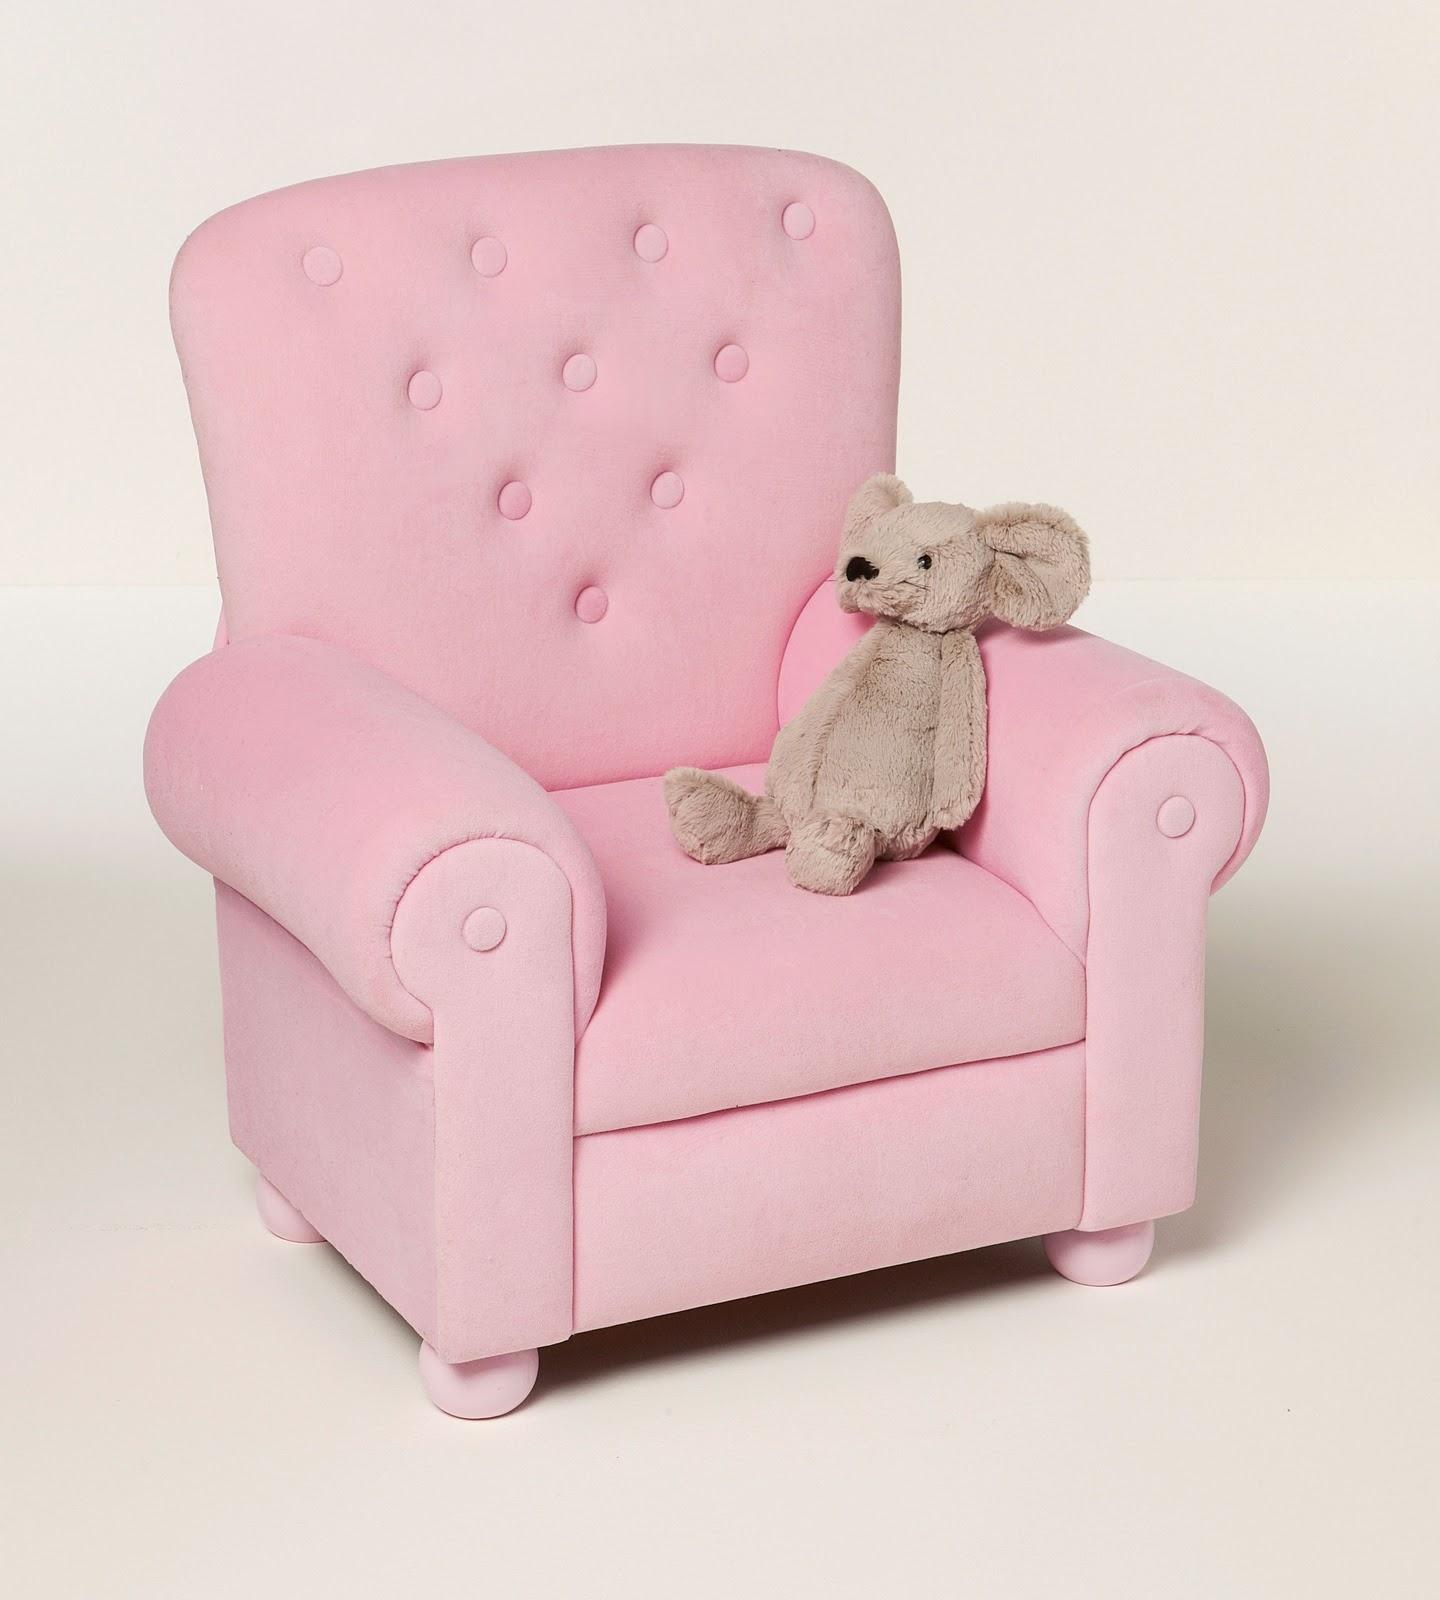 fauteuil enfant. Black Bedroom Furniture Sets. Home Design Ideas